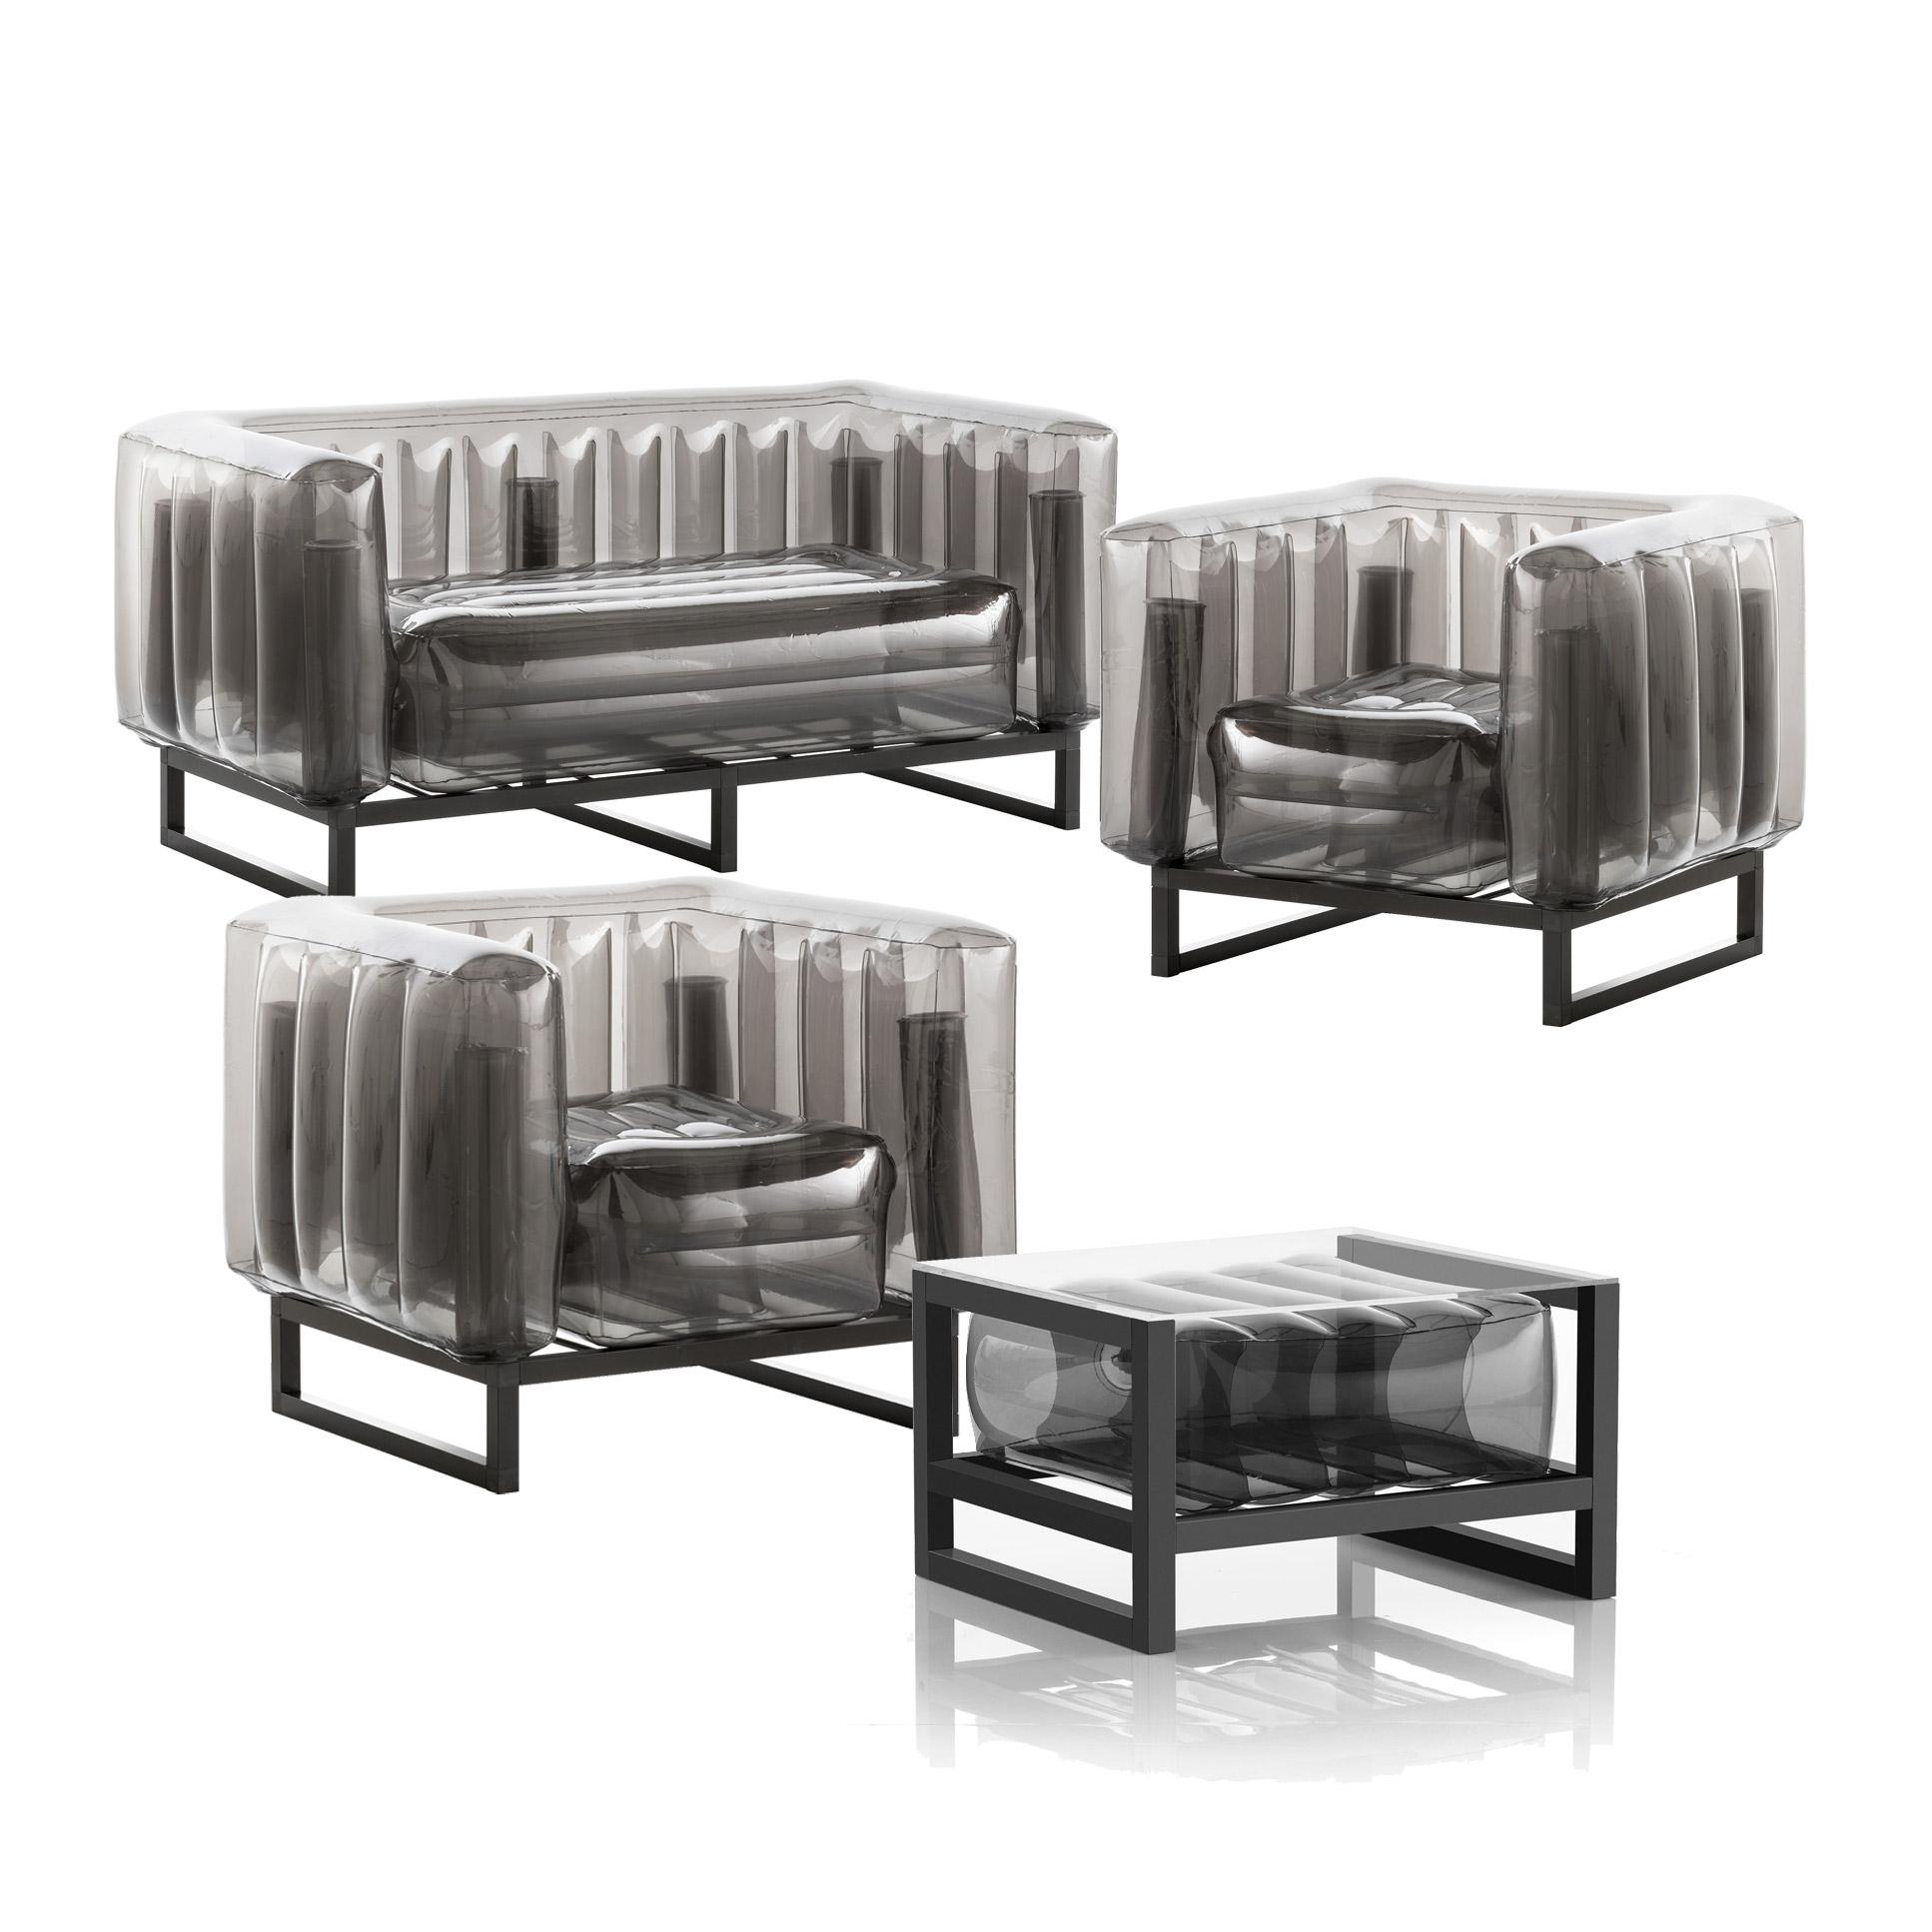 Salon de jardin design 1 canapé, 2 fauteuils et table basse